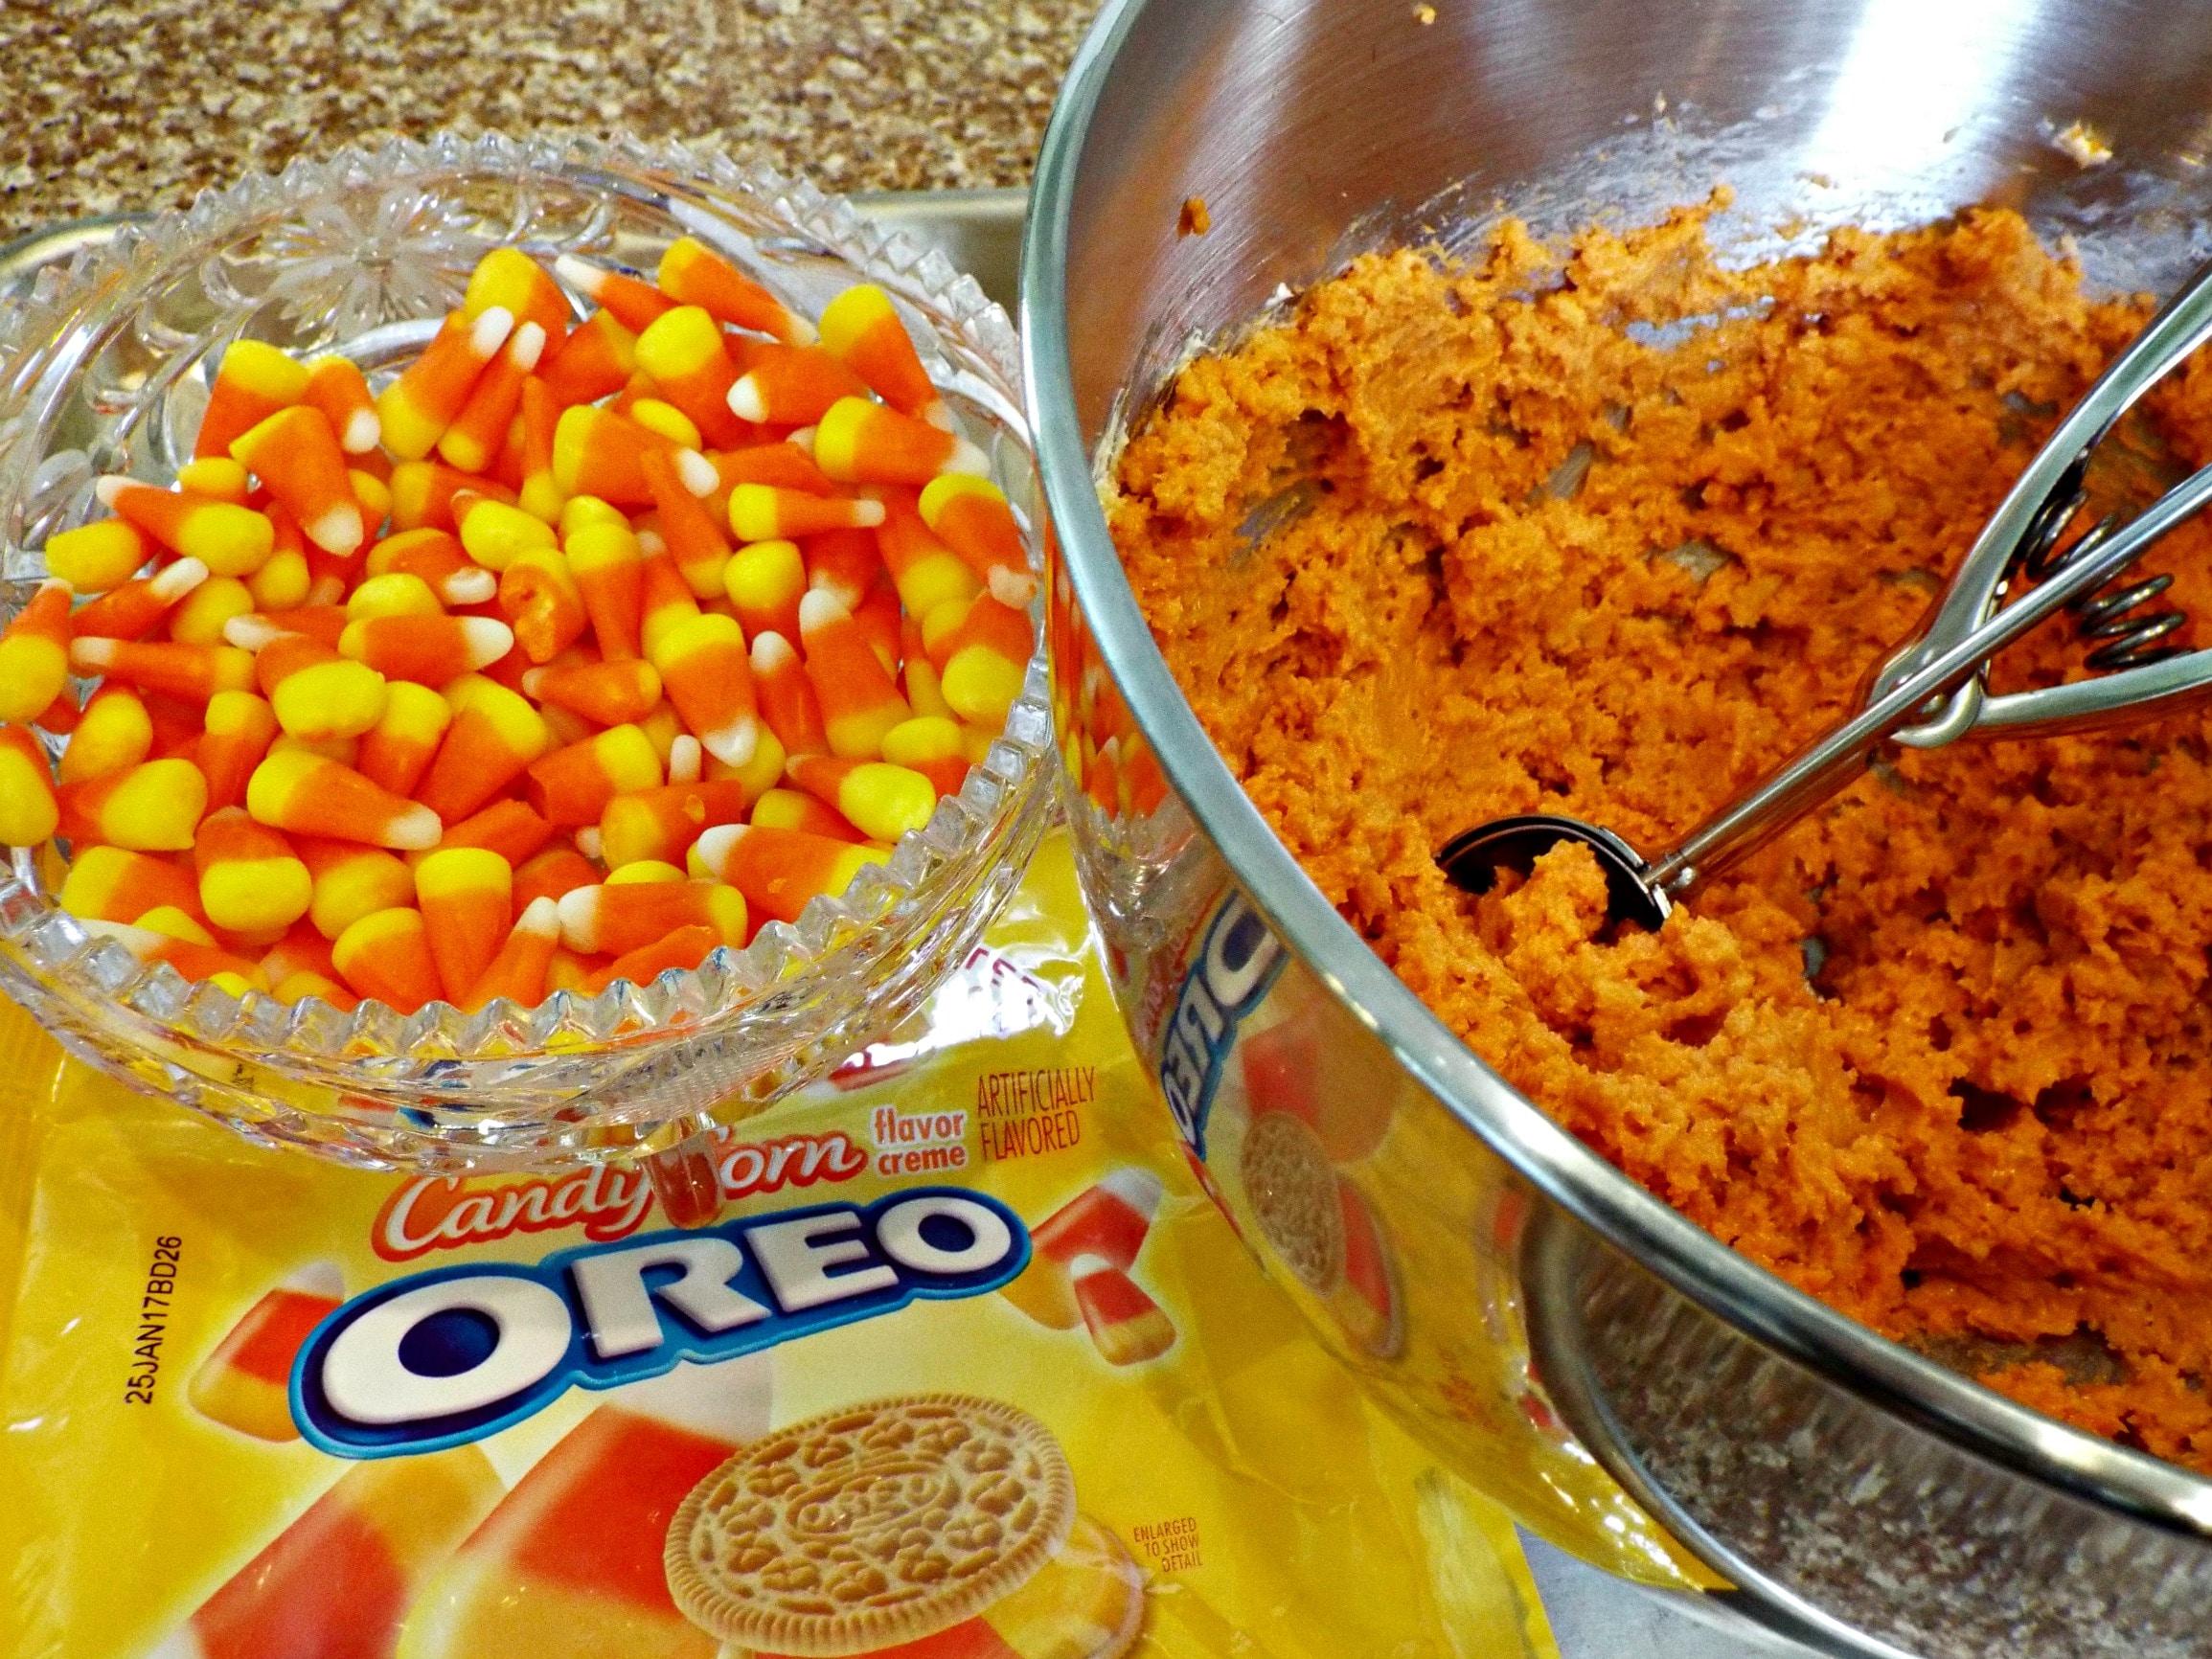 candy-corn-oreo-cookie-mix-f